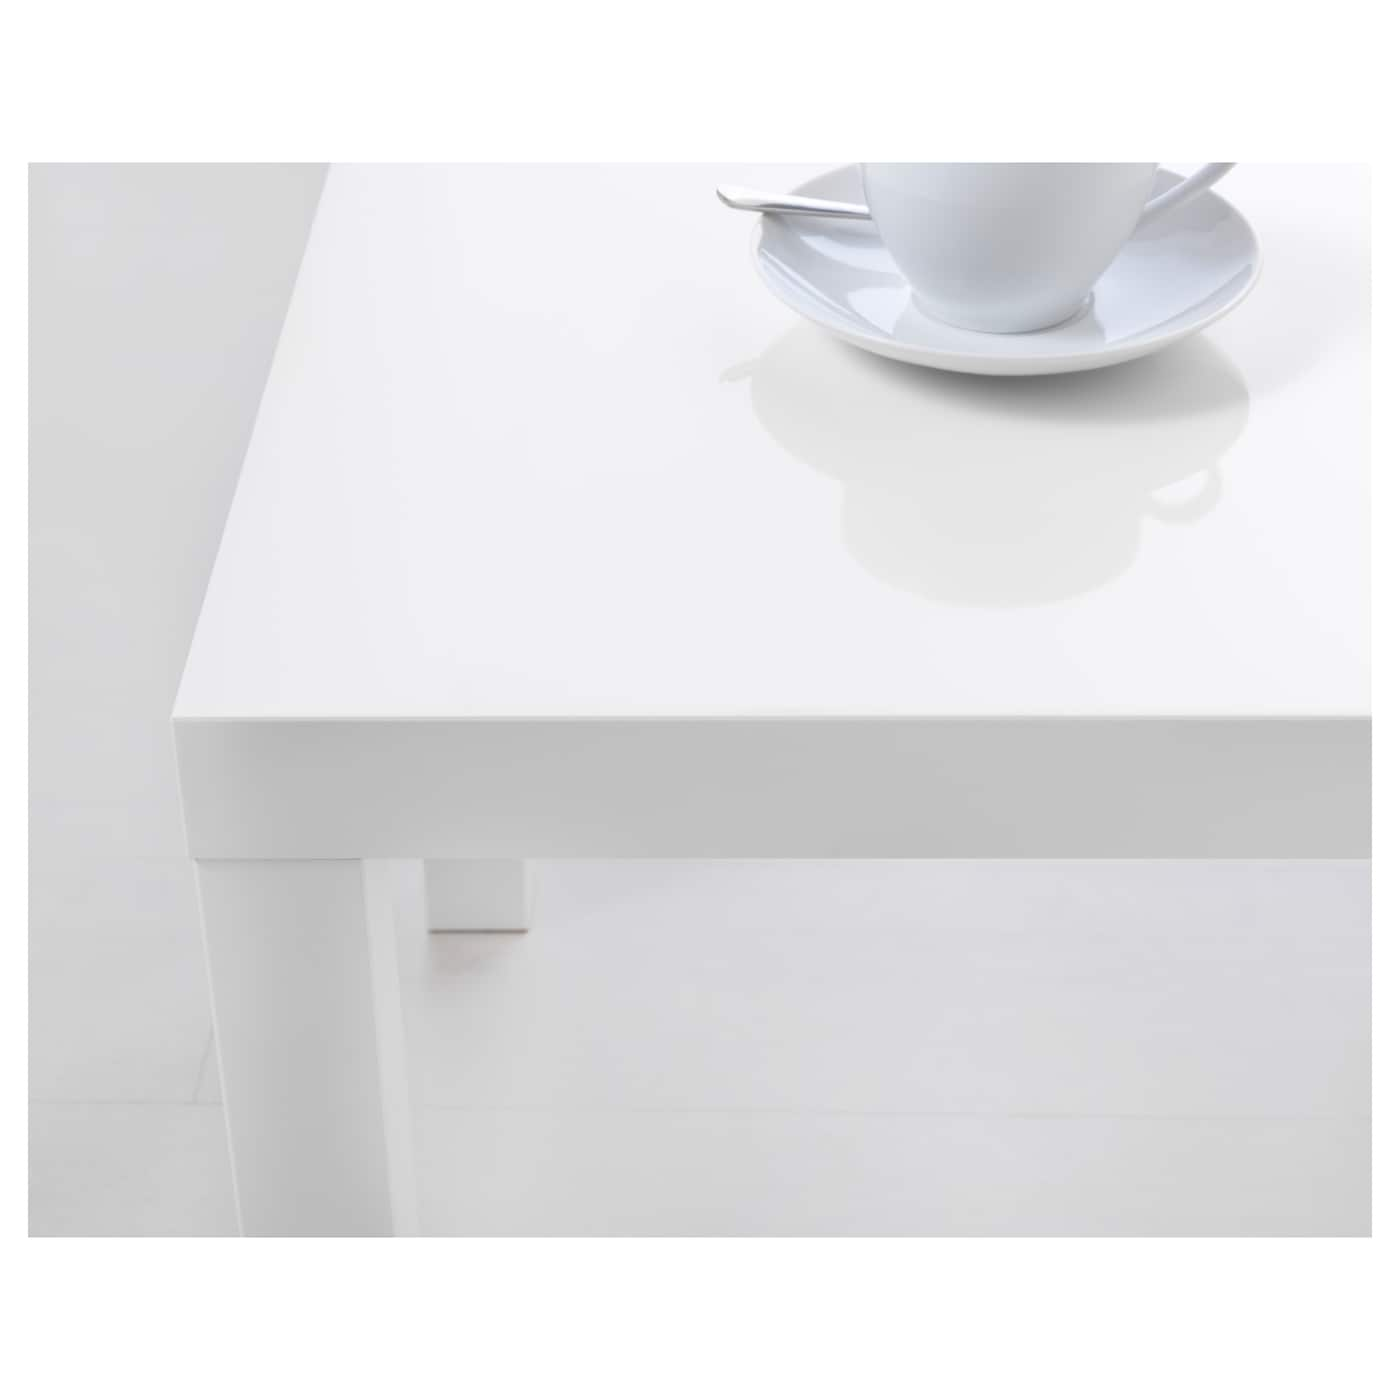 lack side table high gloss white 55 x 55 cm ikea